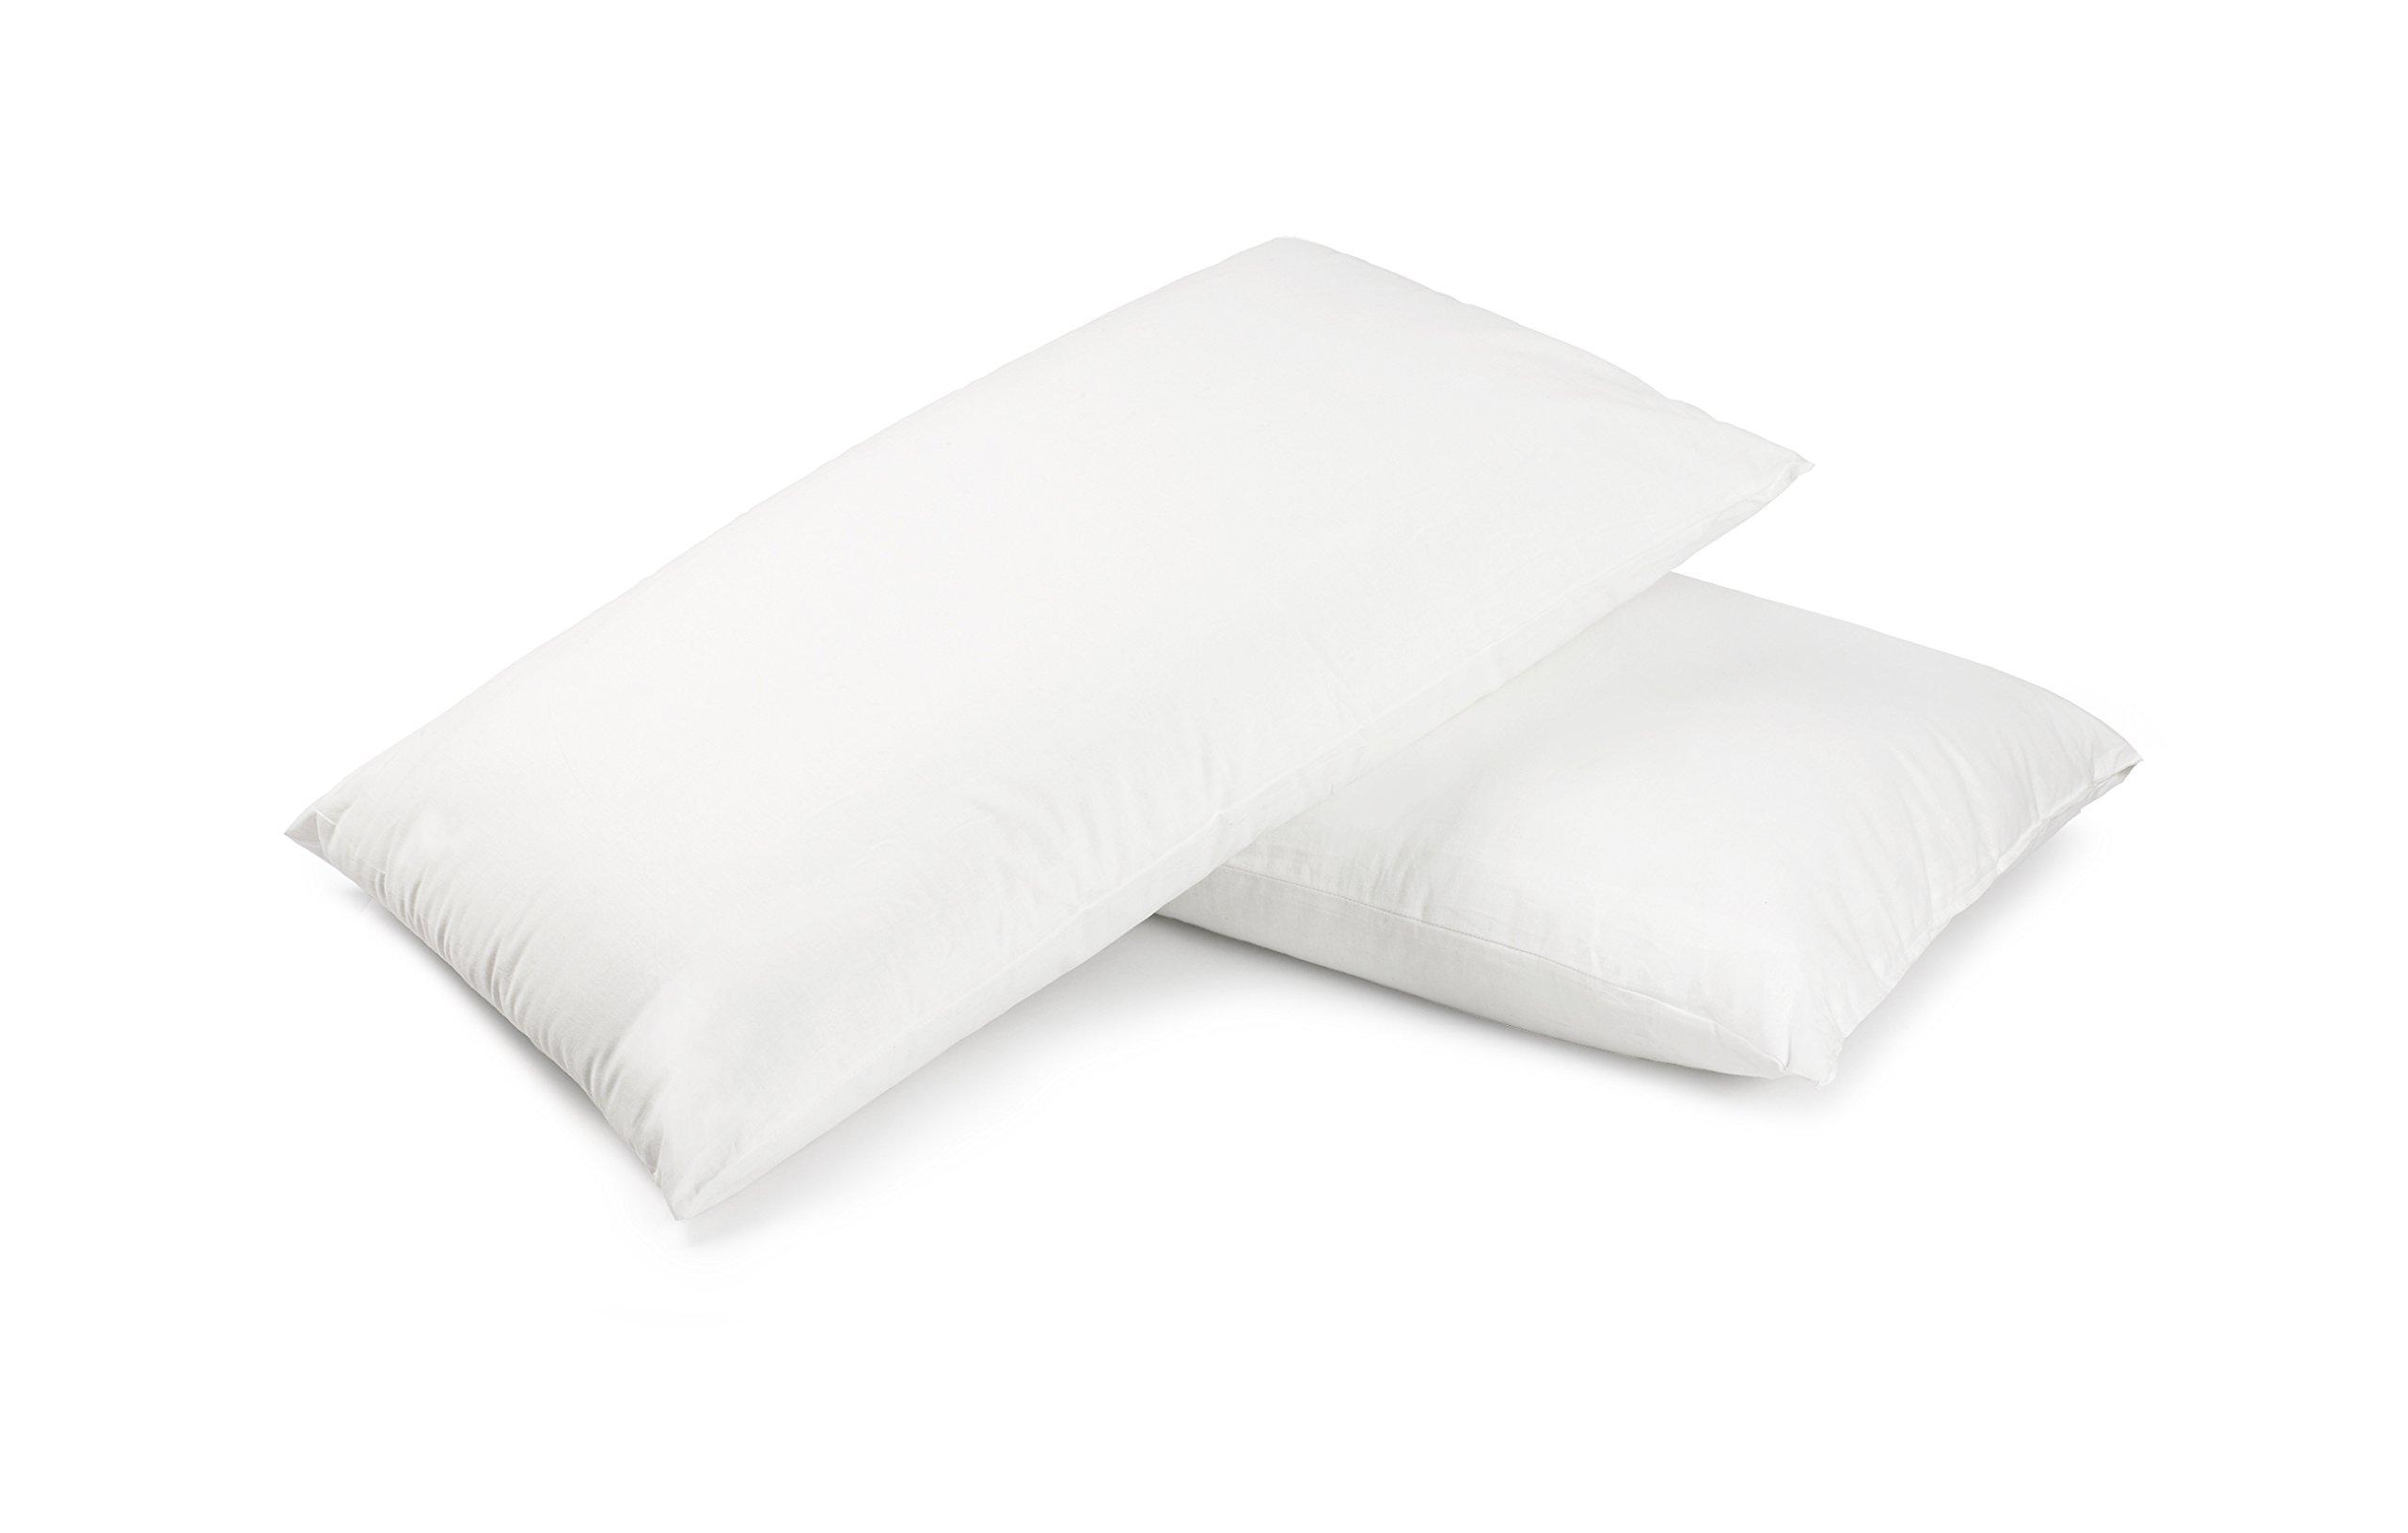 Premium 100% White Goose Down Pillow, Queen Size (Set of 2)